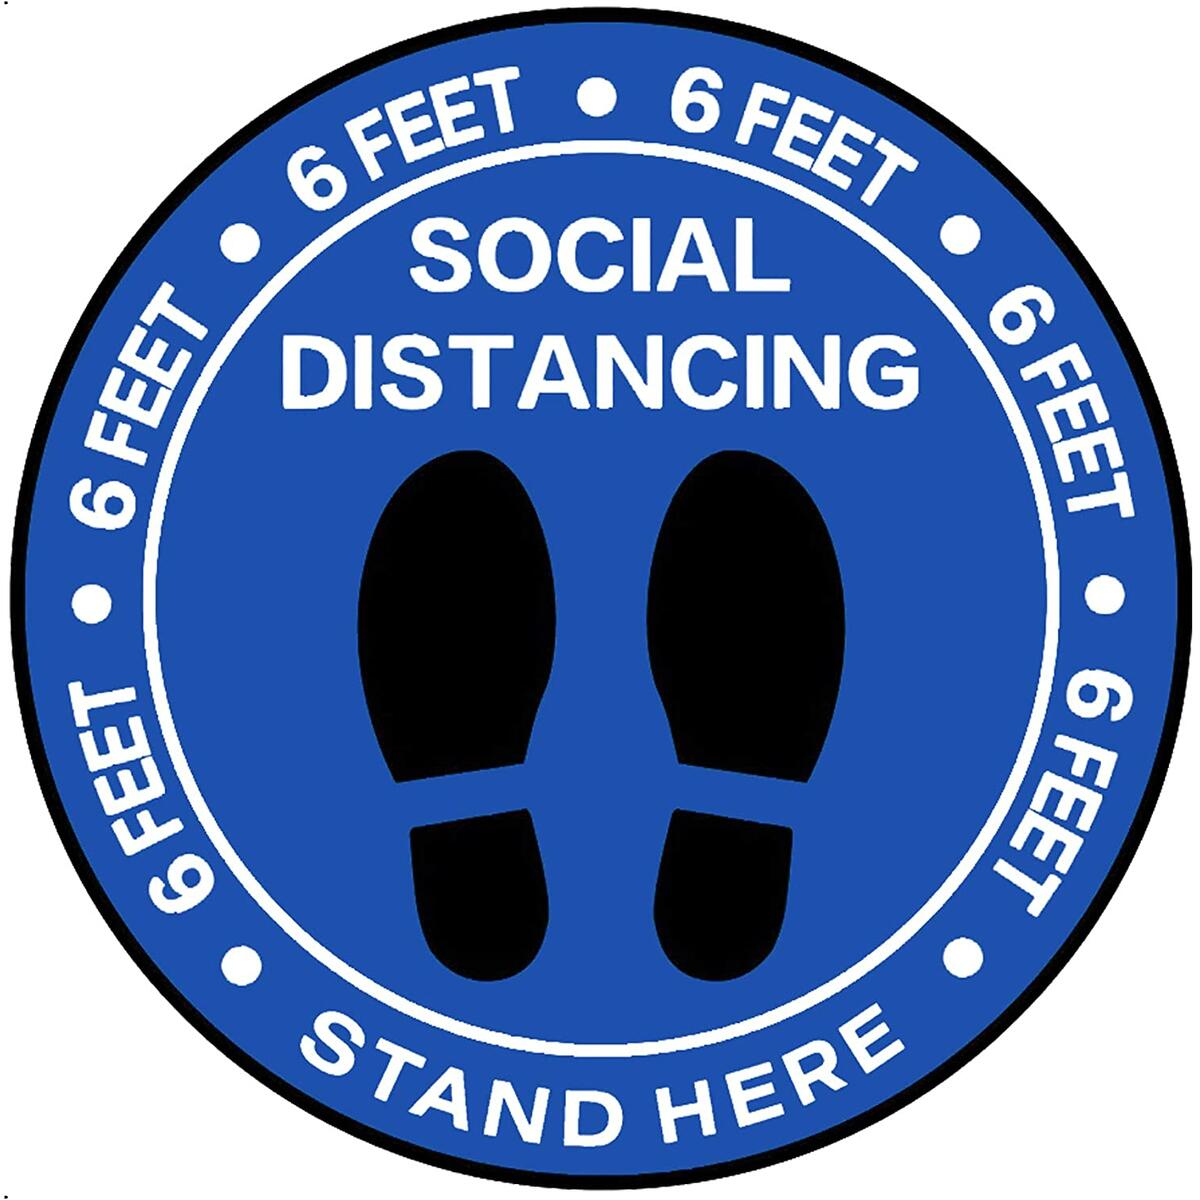 Social Distancing Floor Stickers, 8 Inch Waterproof Safe Distancing Decals, Tear-Resistant Vinyl Crowd Control Signs, Floor Markers for School, Supermarket, Store, Business, Work, Church - Pack of 30